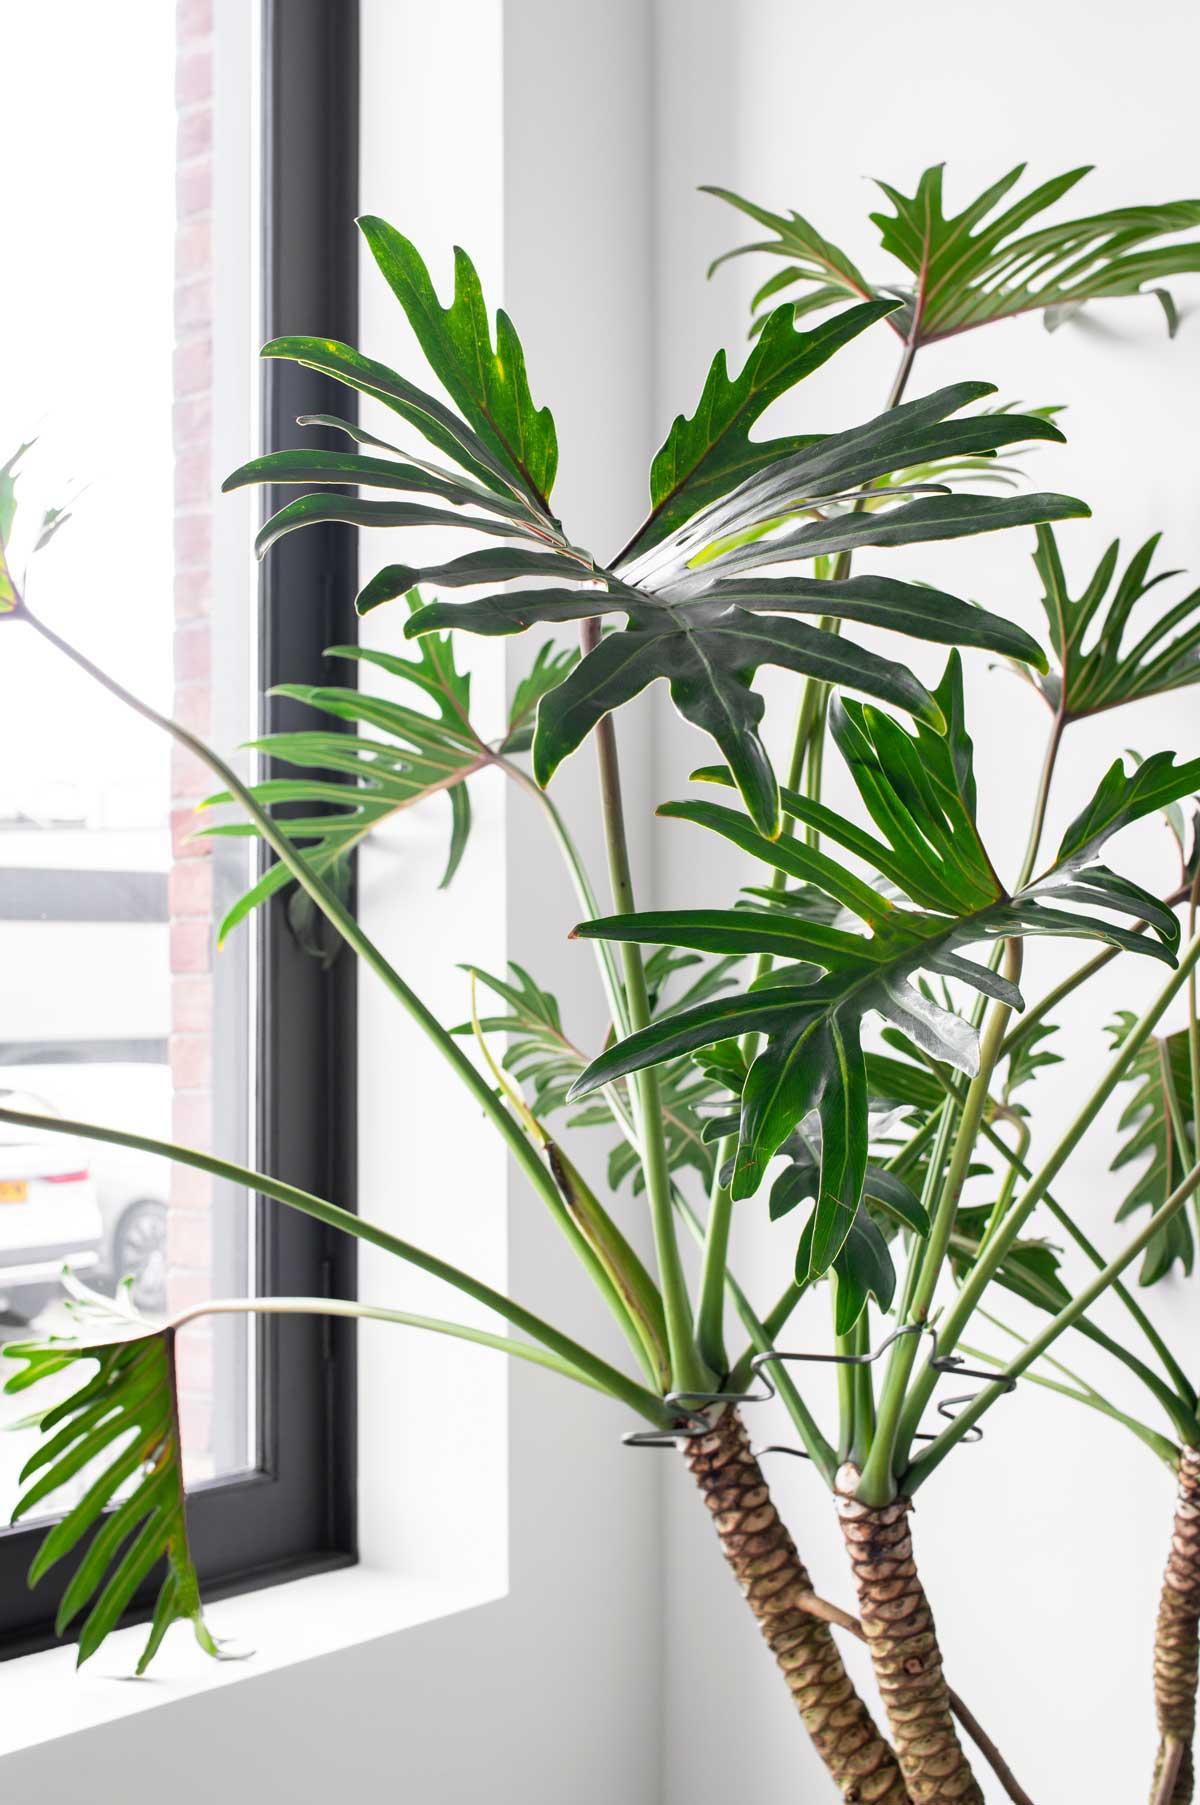 Philodendron Xanadu - Tanja van Hoogdalem